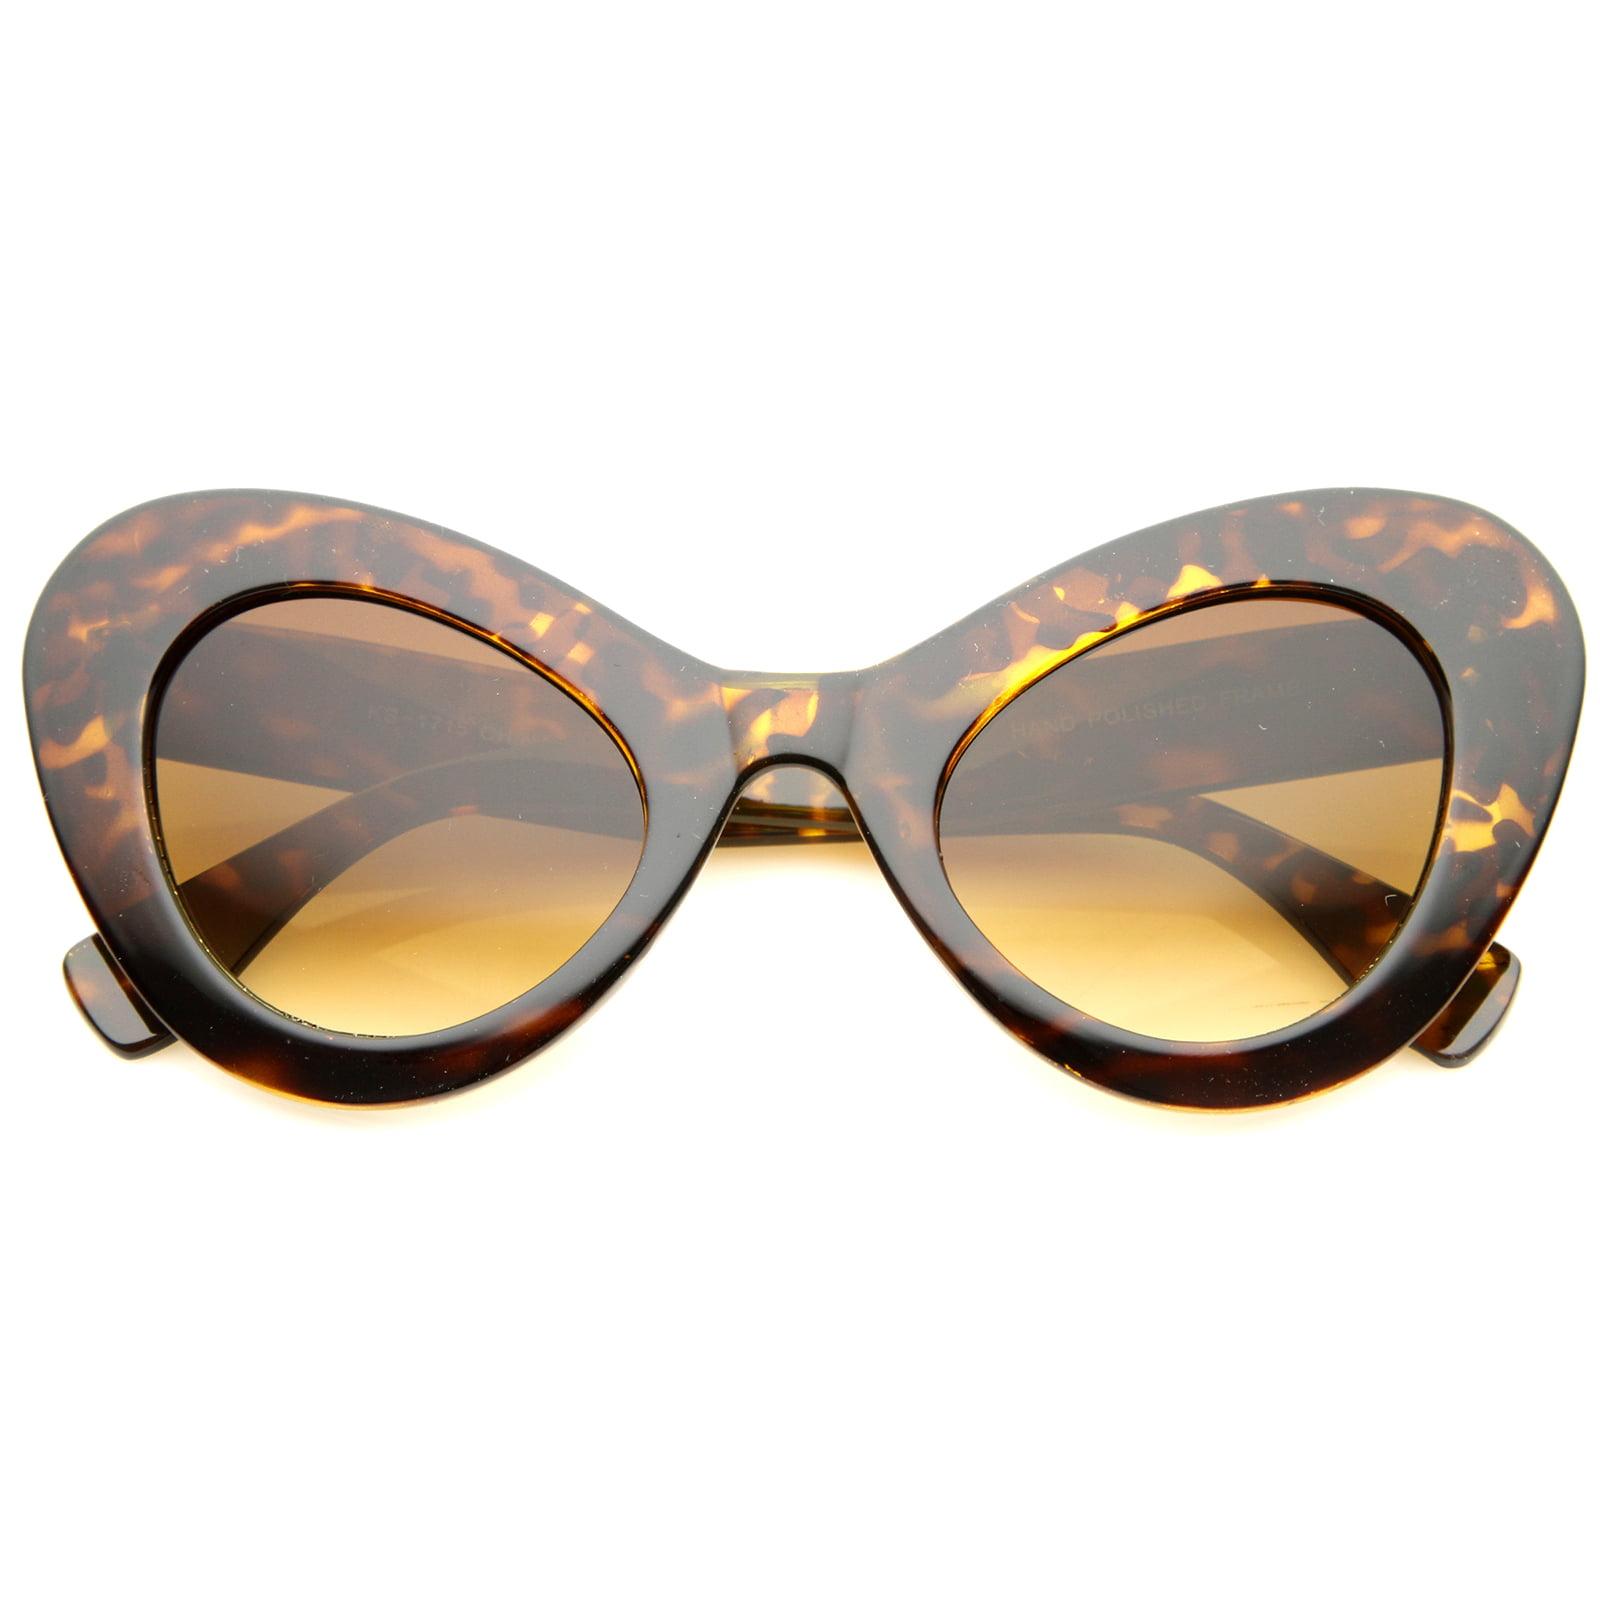 sunglassLA - Womens Cat Eye Sunglasses With UV400 Protected Gradient Lens - 55mm